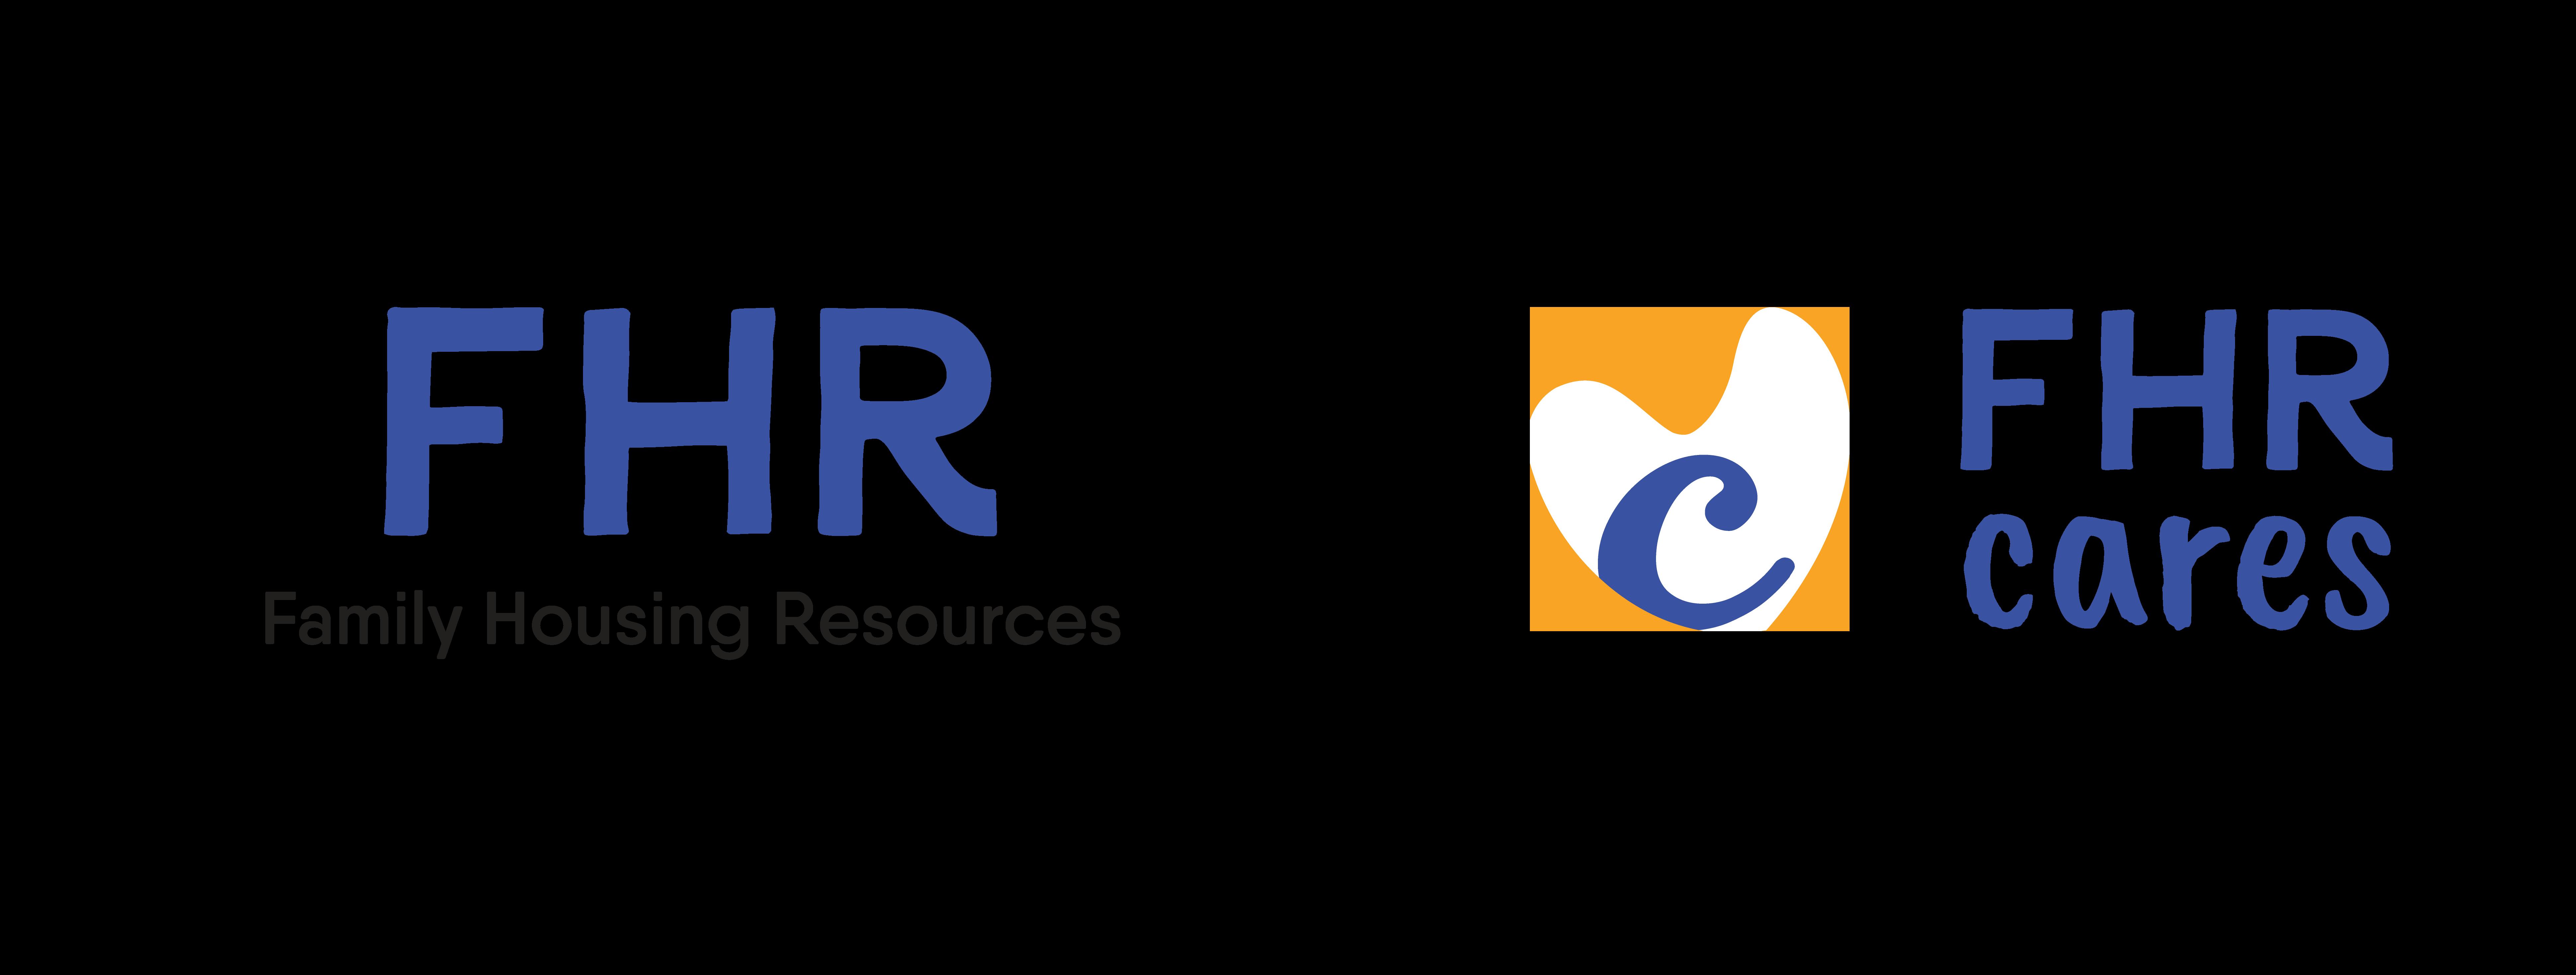 SFW_logo_redesign_assets_FHR-after